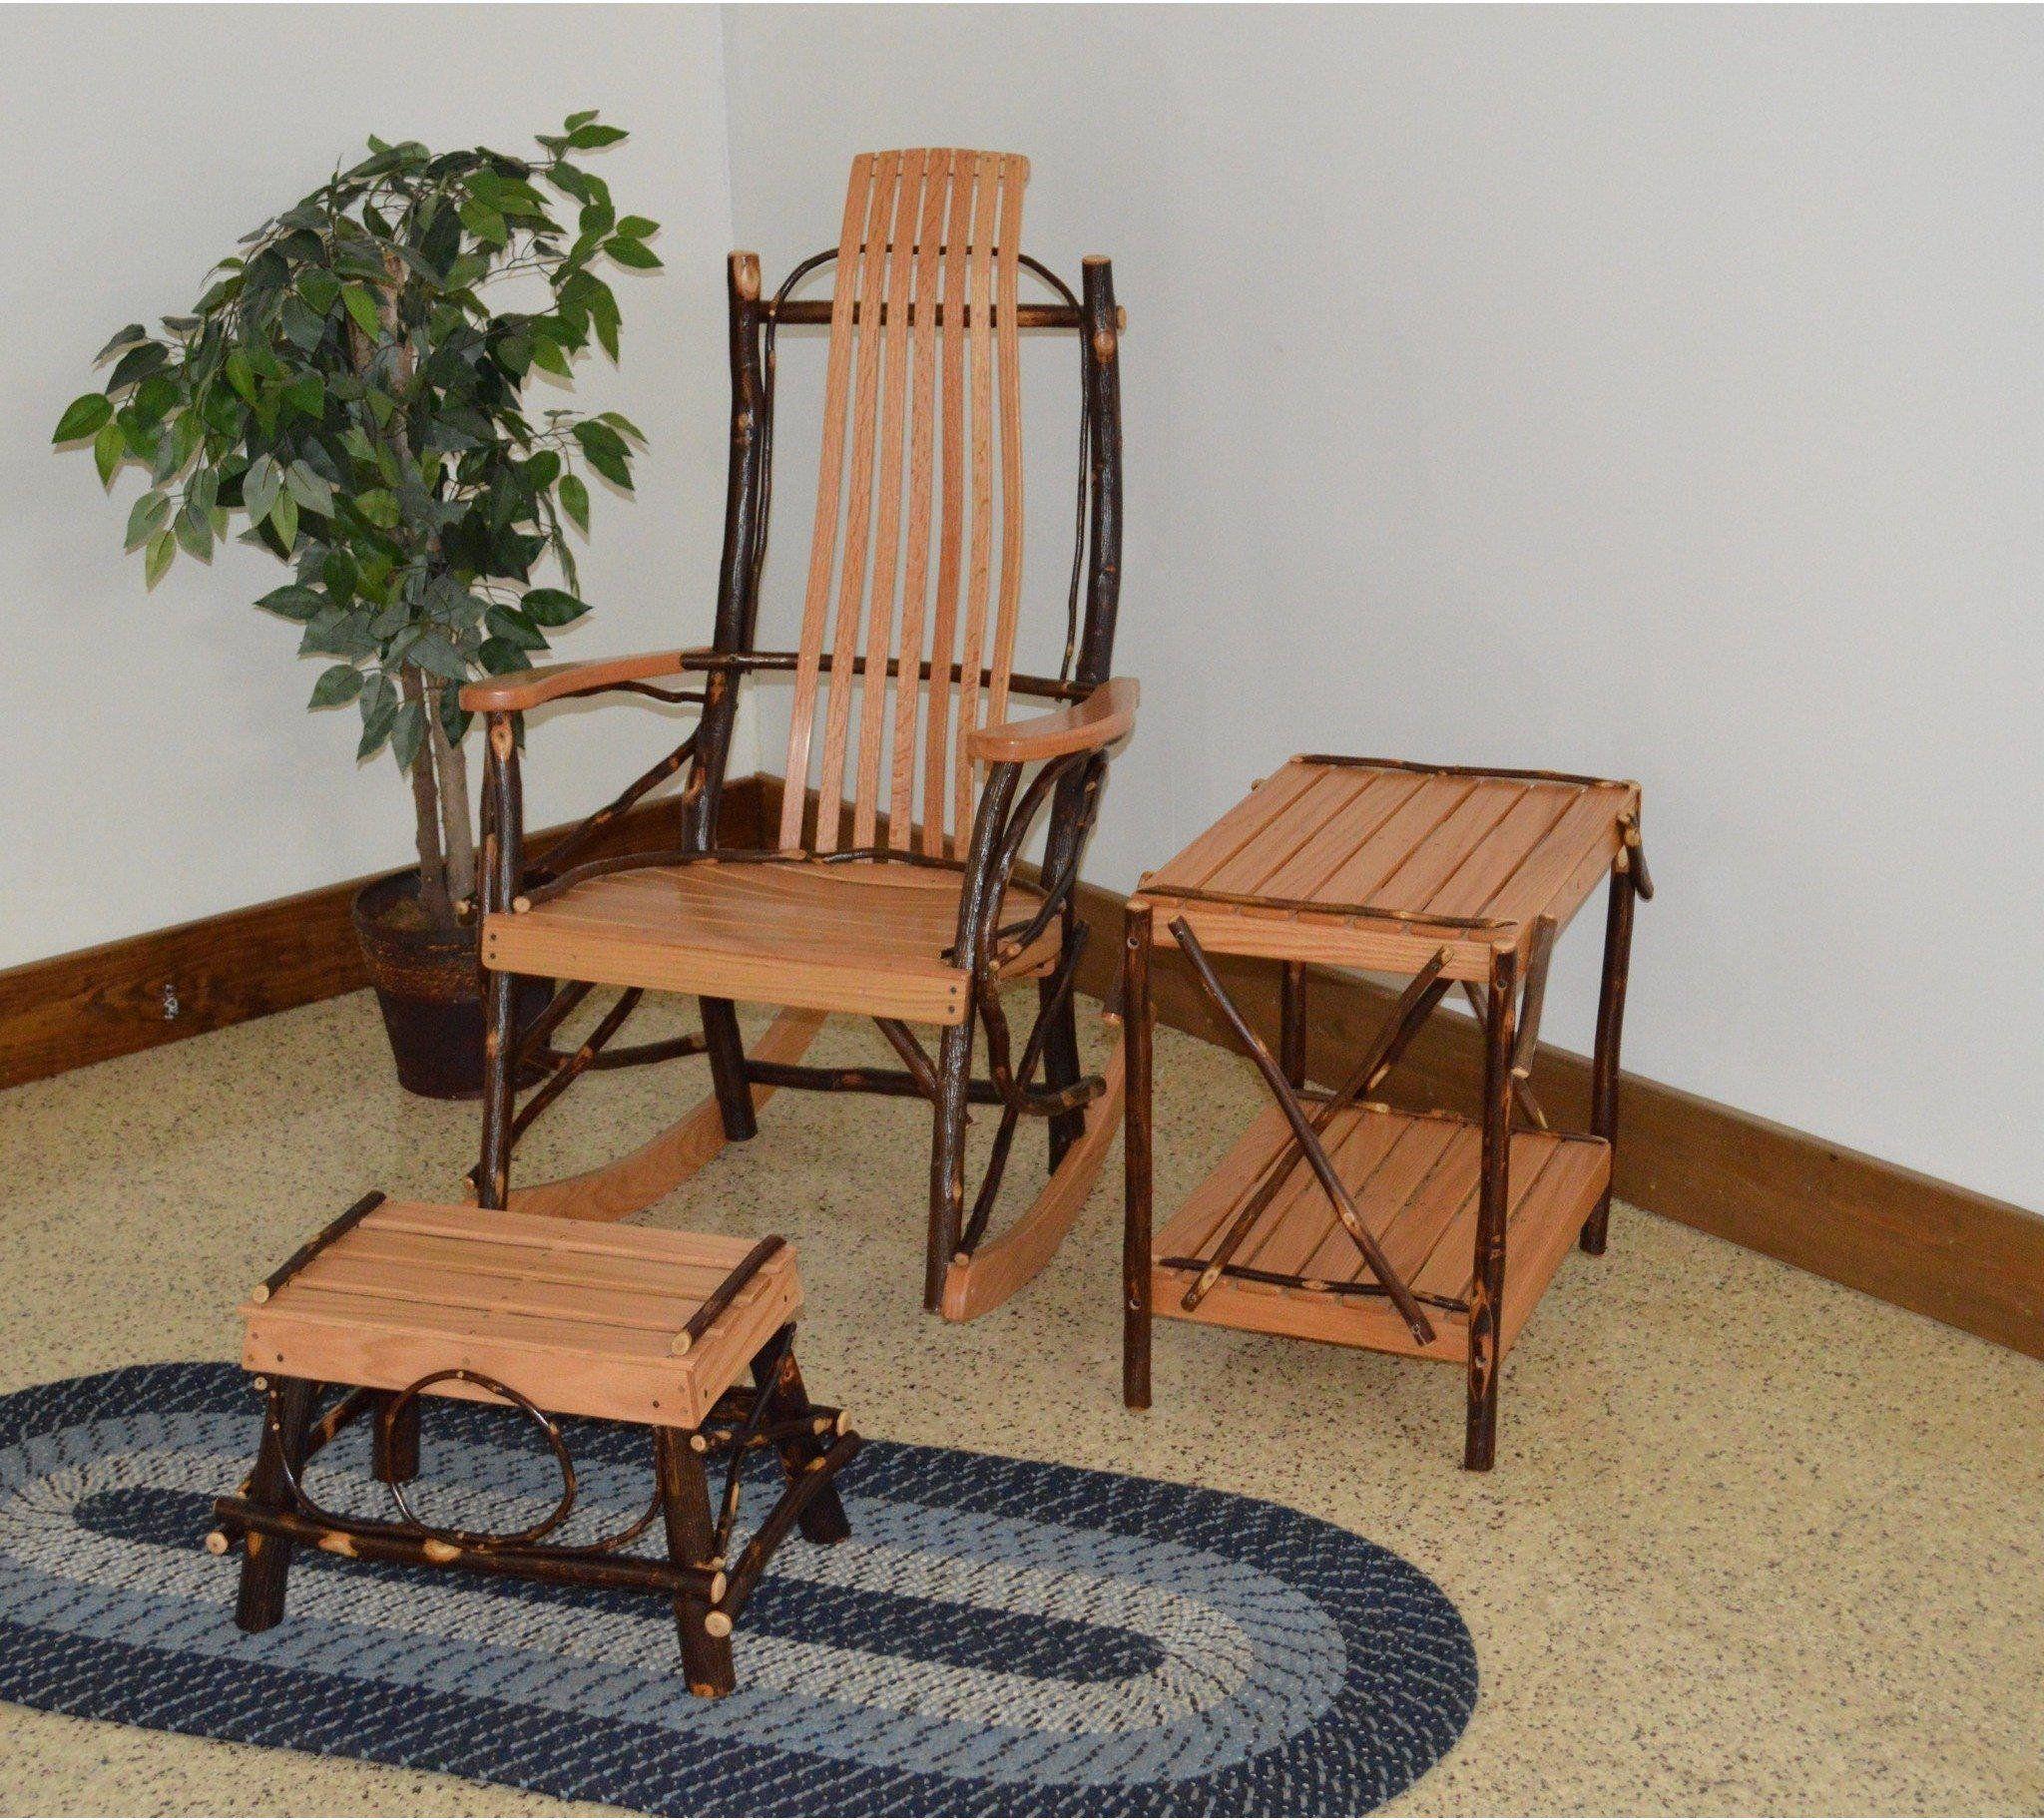 A & L Furniture Co. Amish Bentwood 7Slat Hickory Rocking